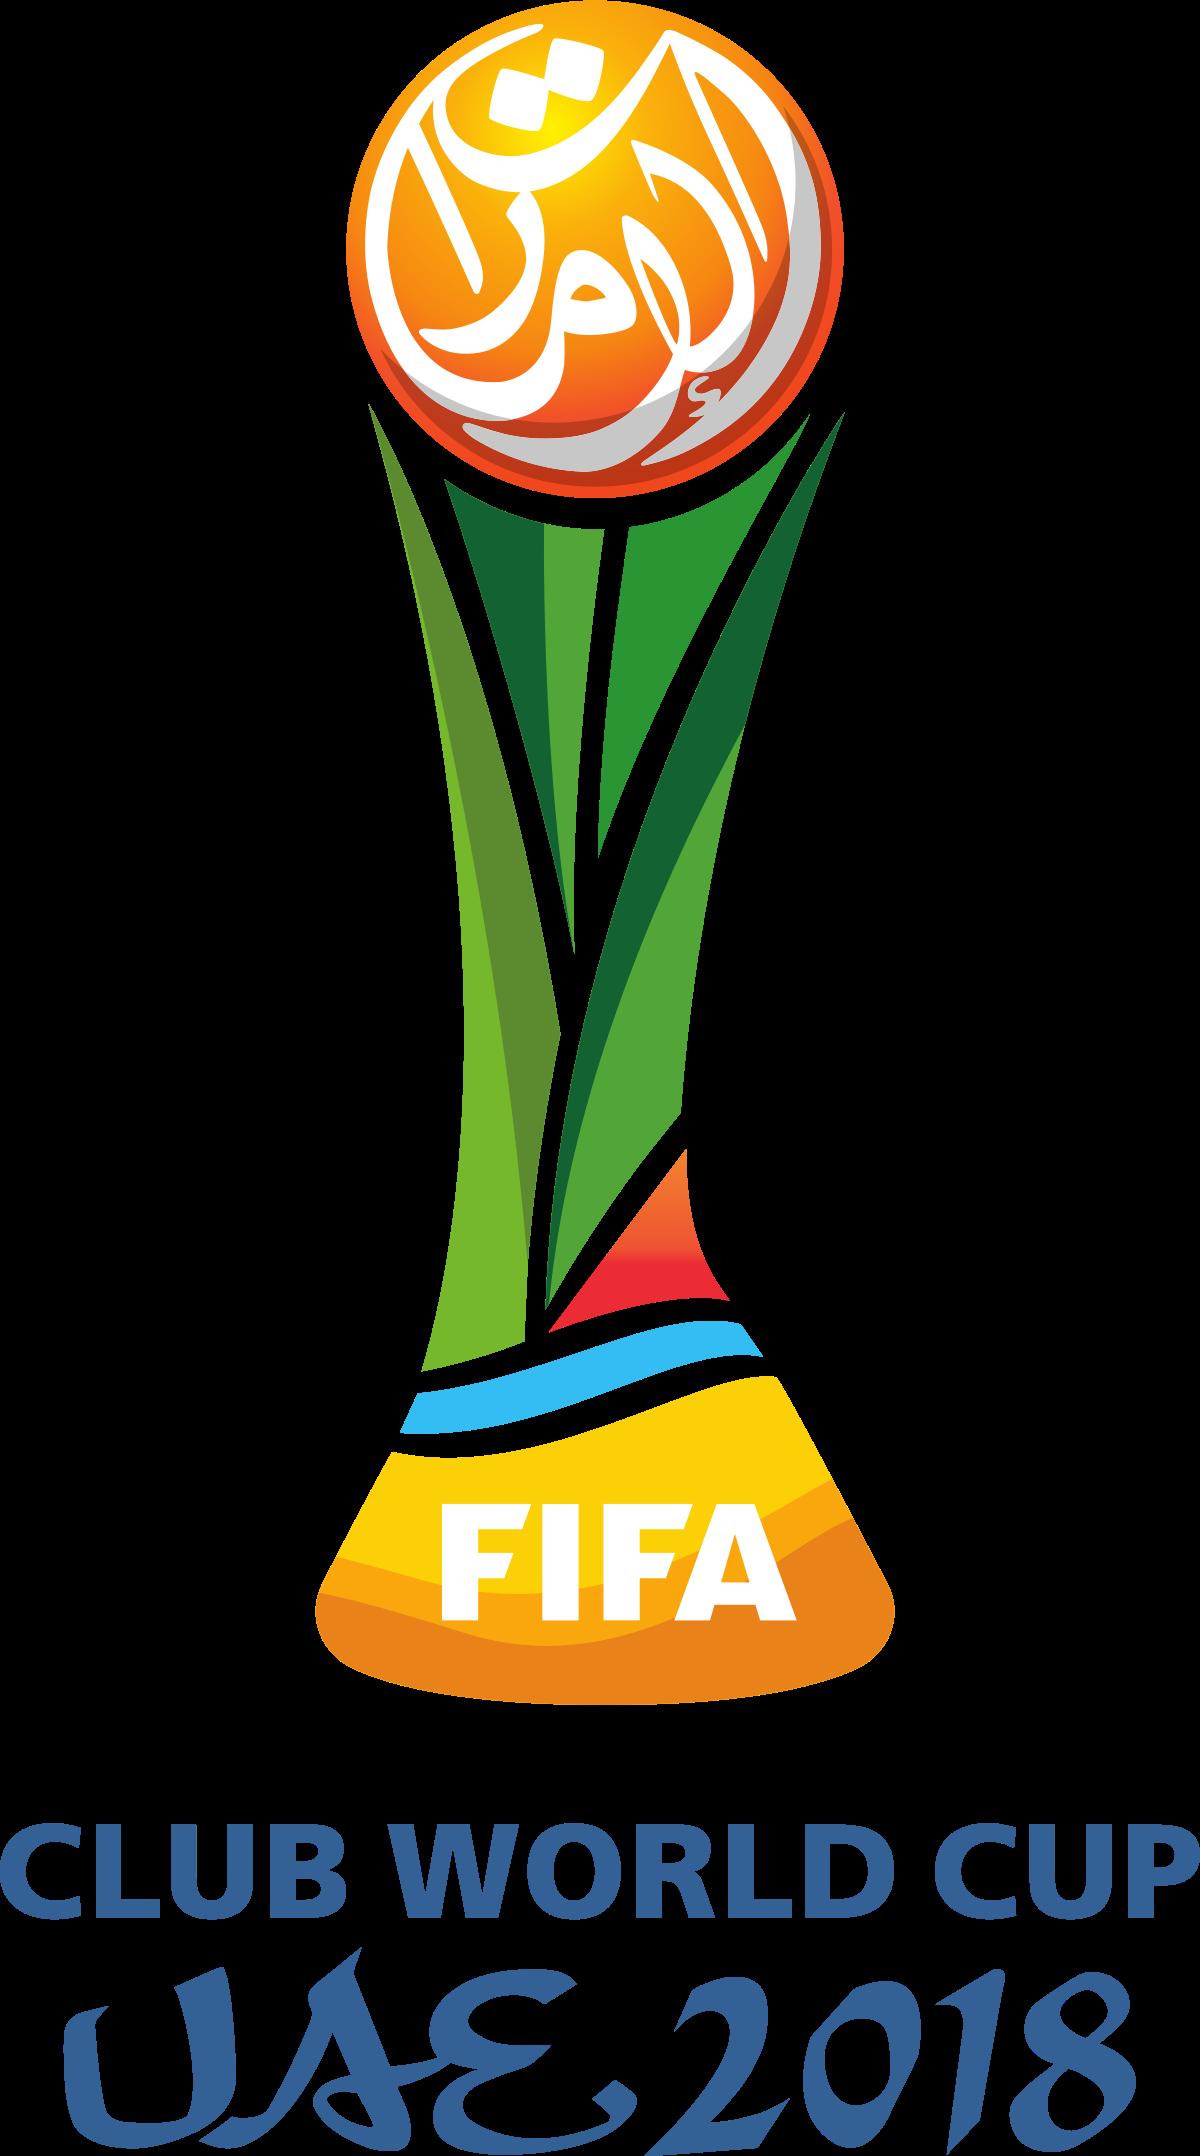 2018 FIFA Club World Cup.